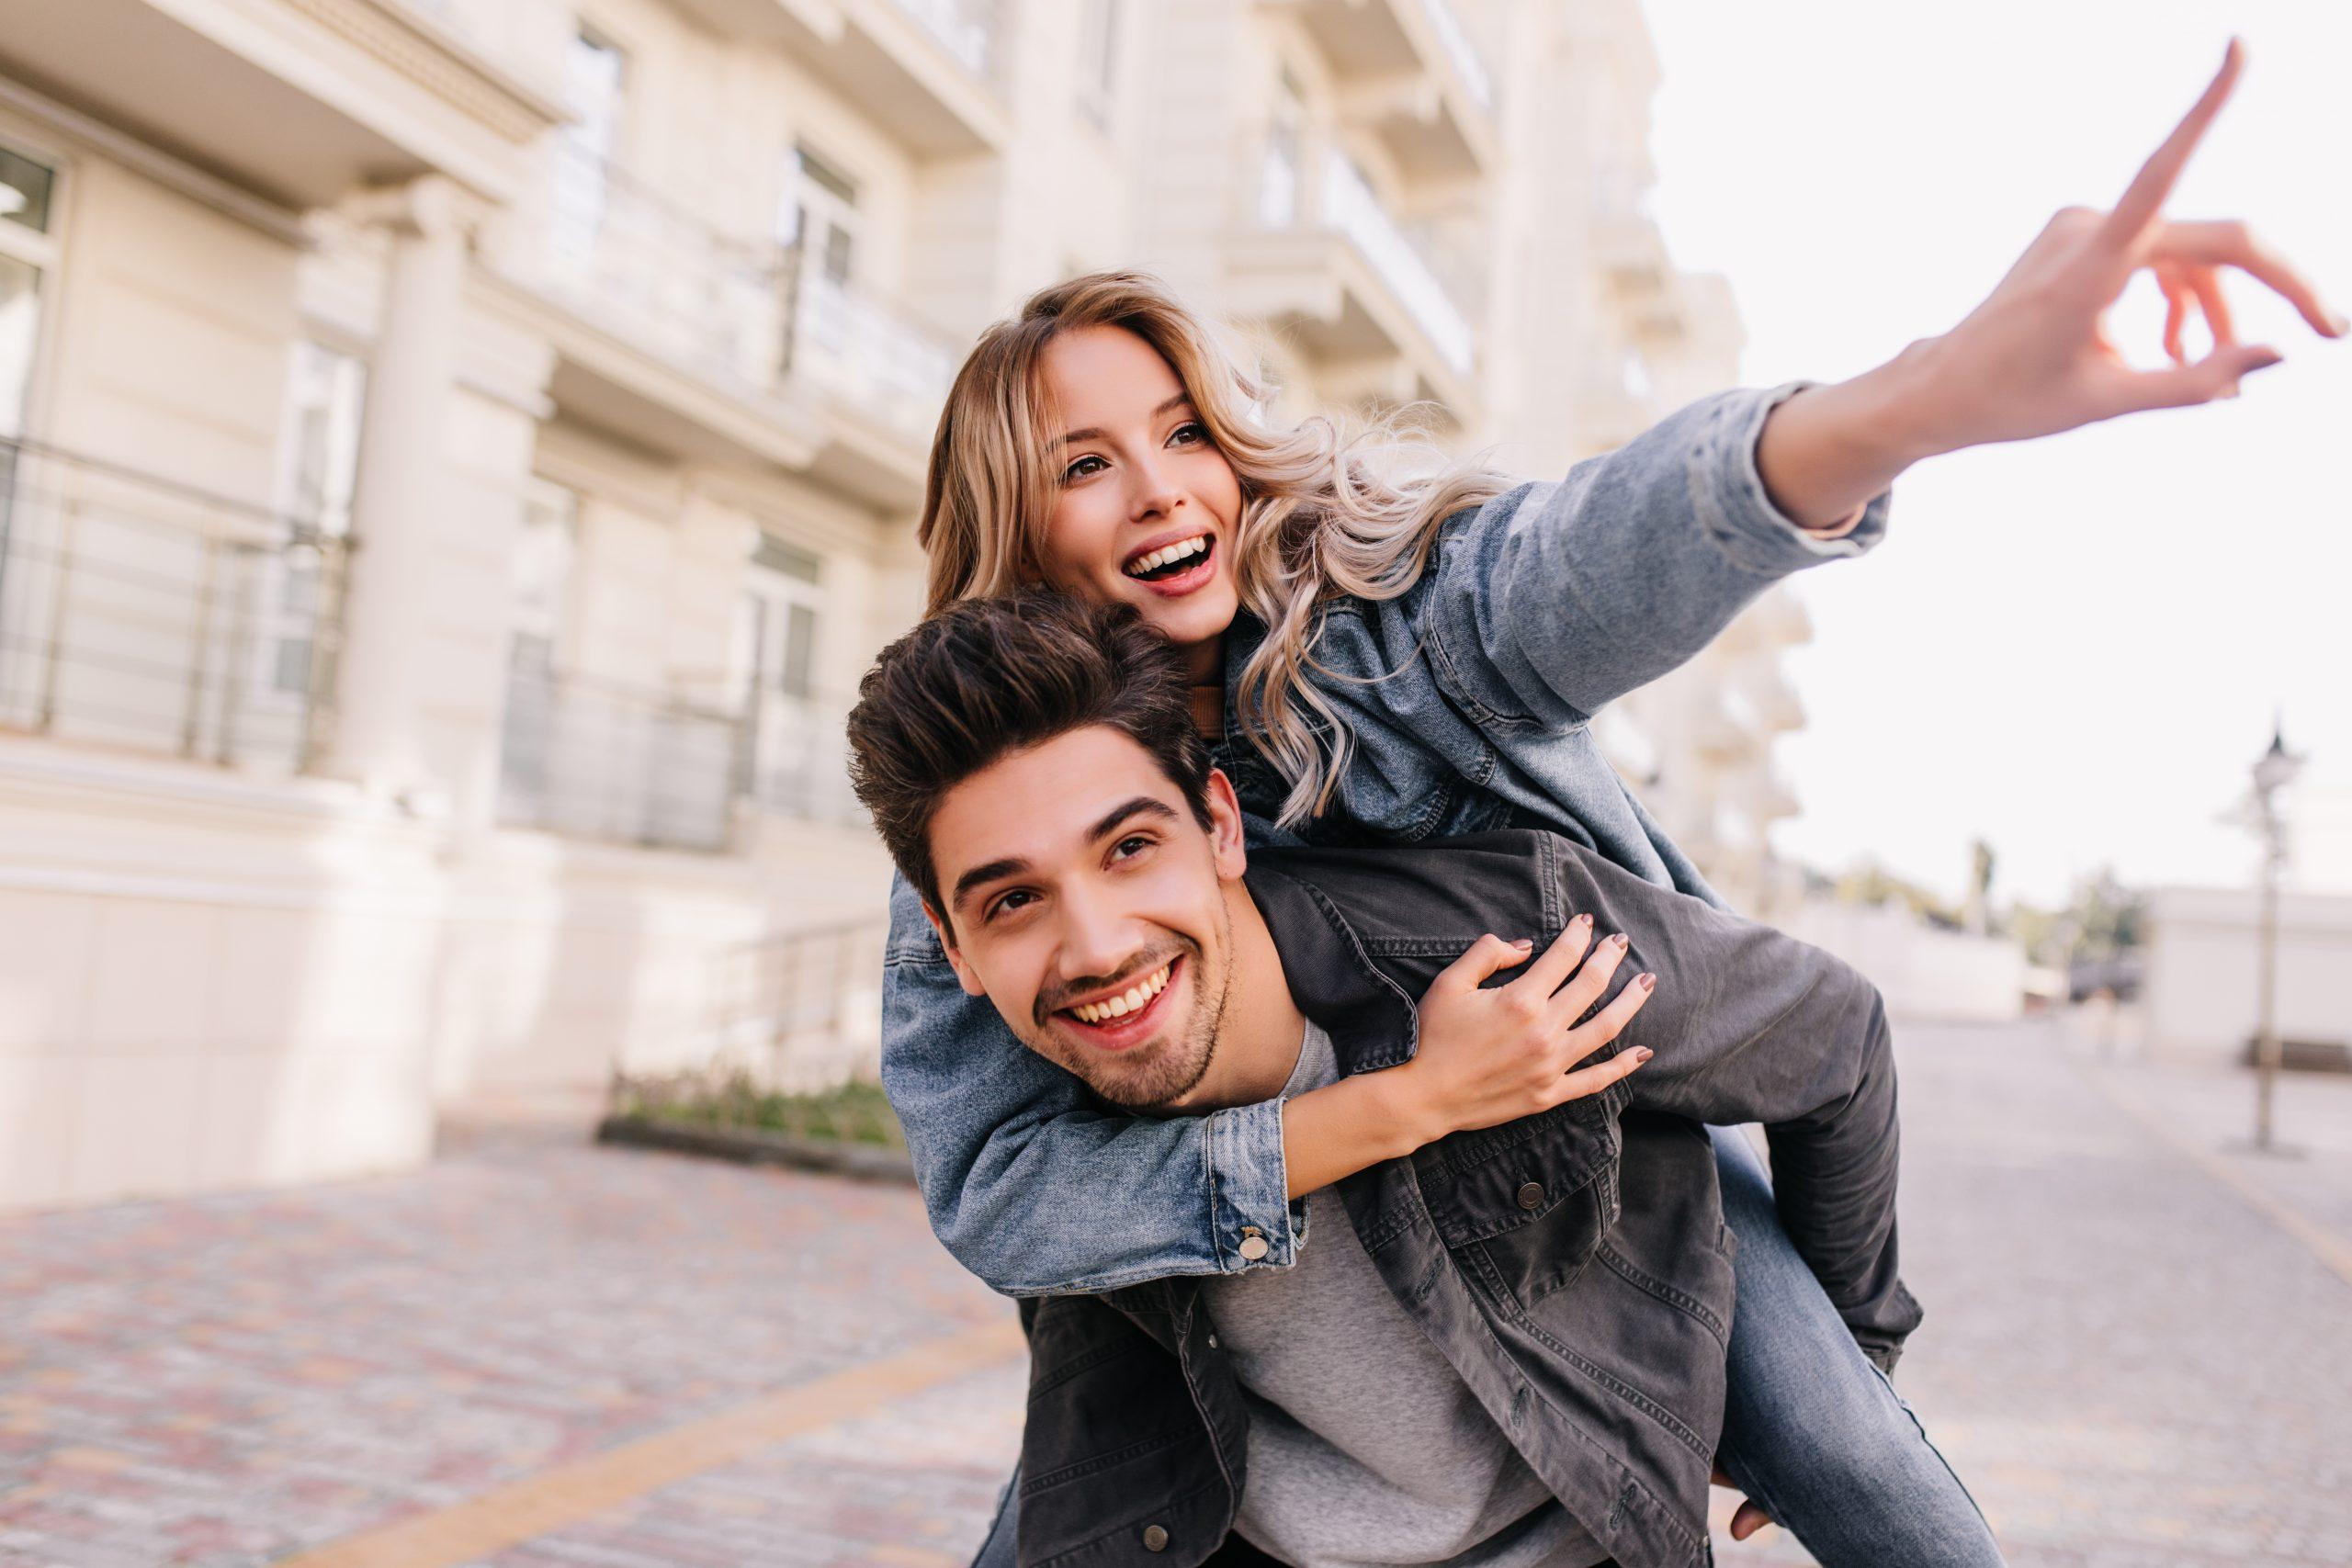 Caucasian pretty girl walking around city with boyfriend. Smiling brunette man spending weekend with girlfriend.